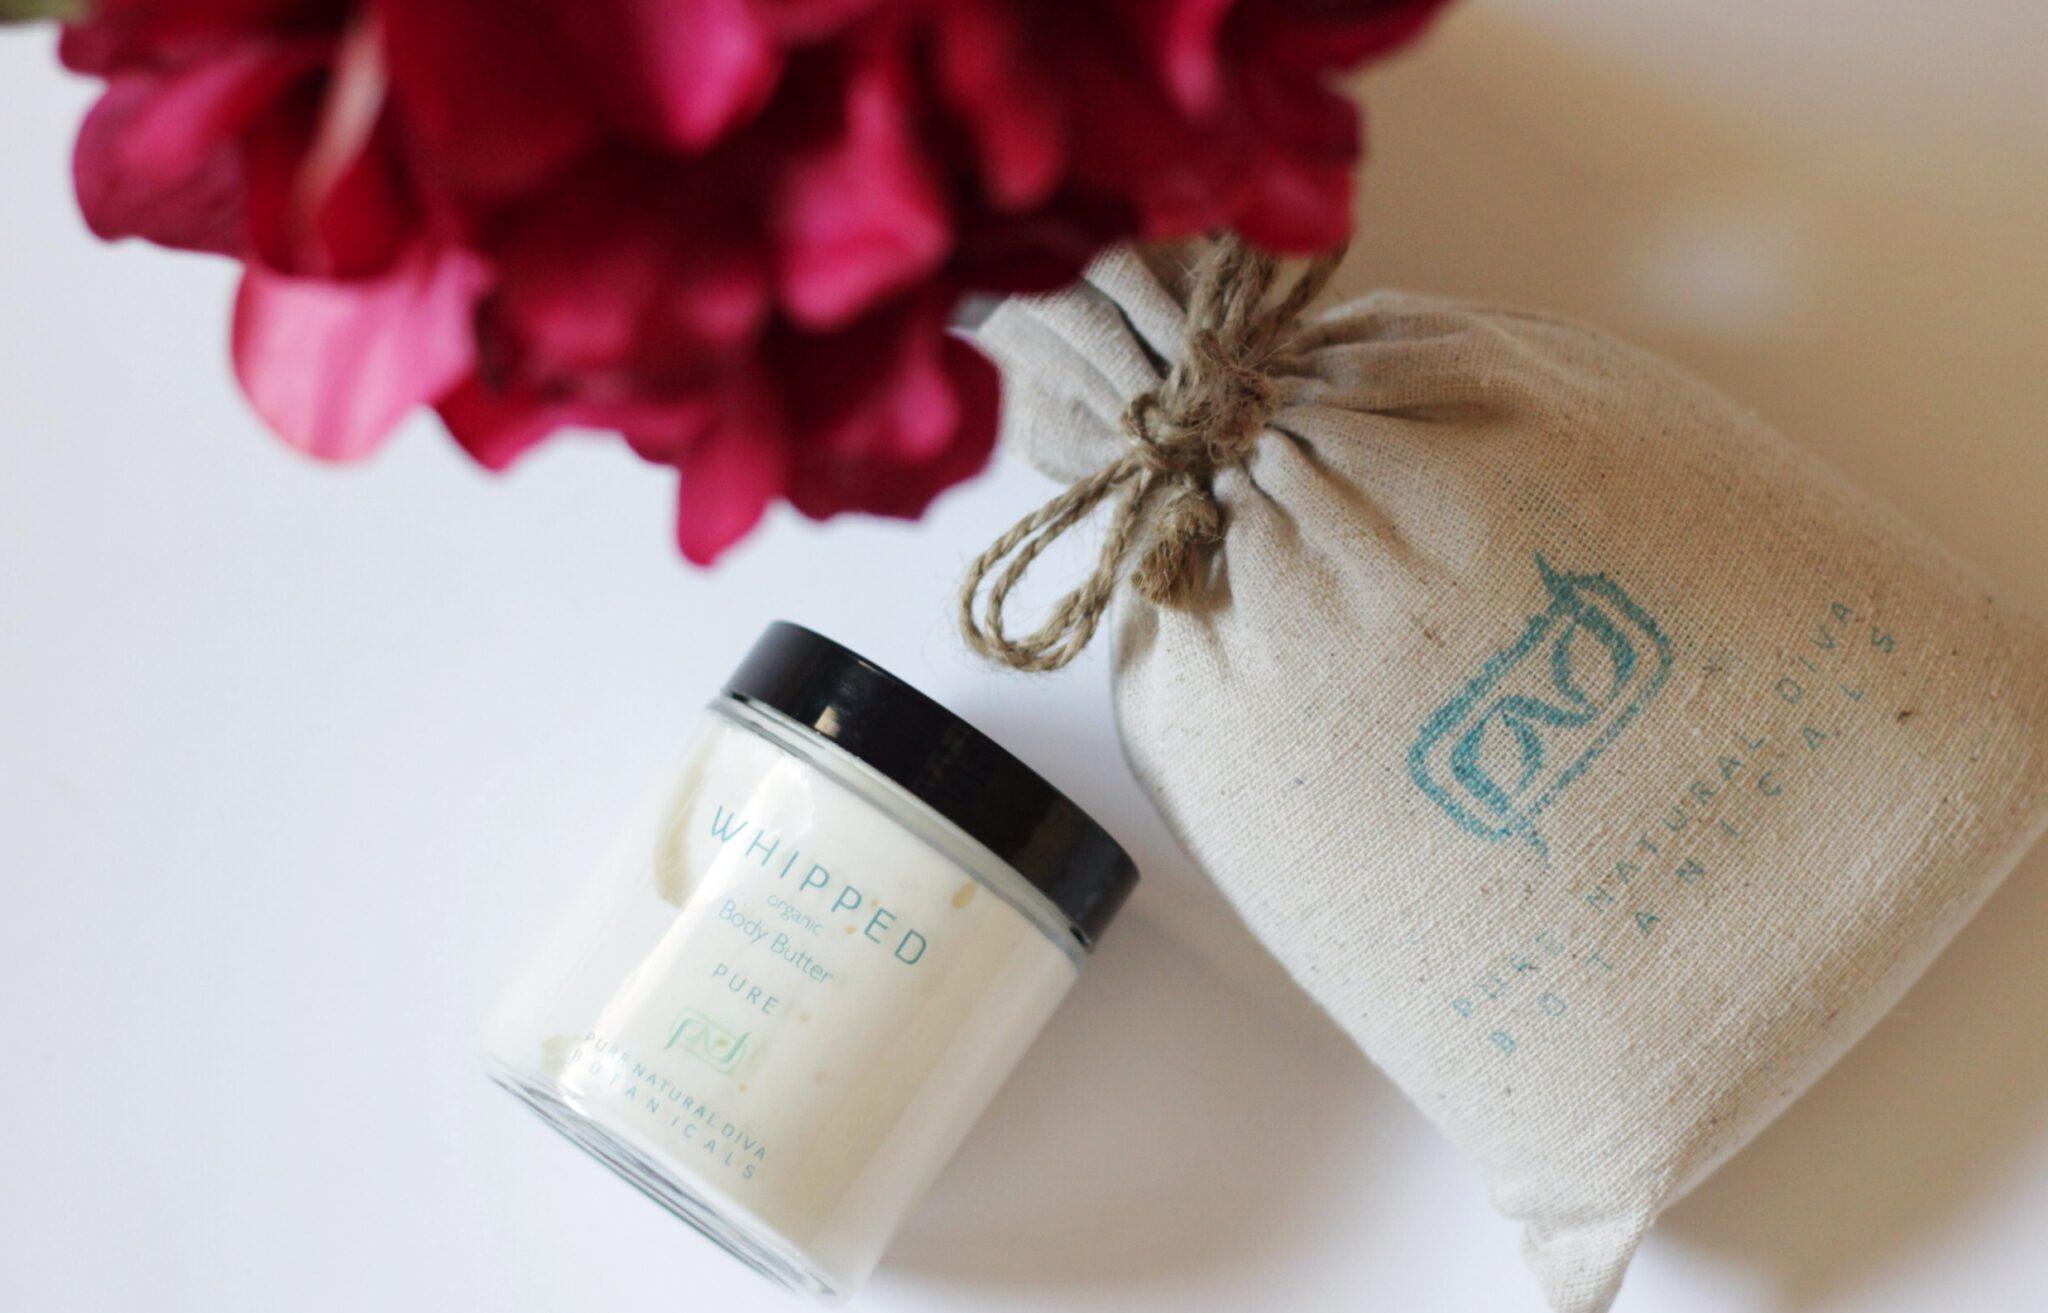 Pure-Natural-Diva-Botanical-Organic-Perfume-Natural-Perfume-Essential-Oils